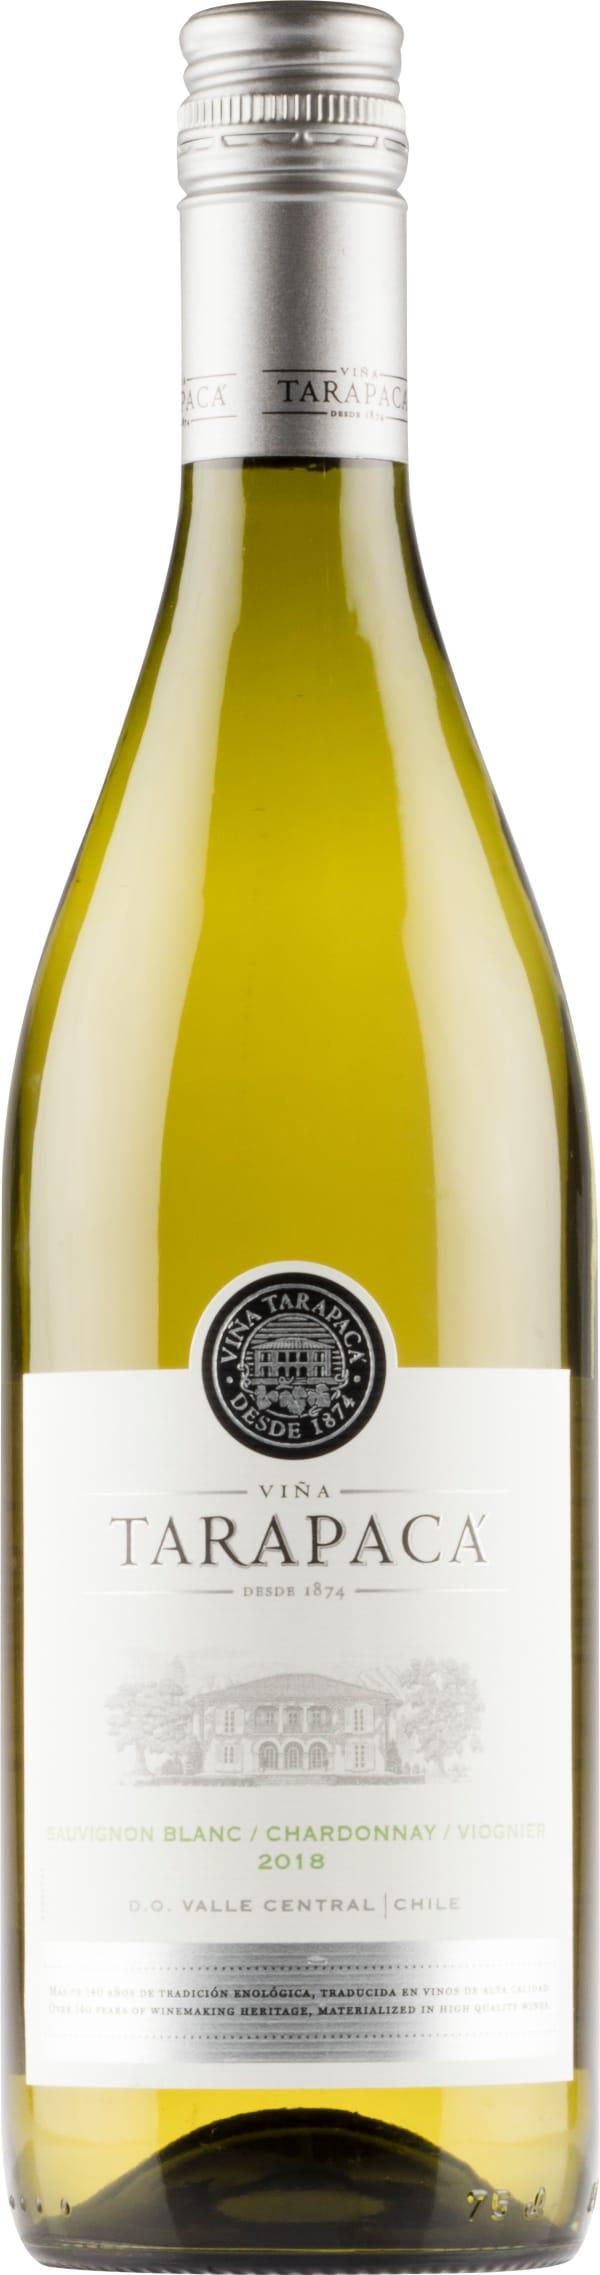 Tarapacá Sauvignon Blanc Chardonnay Viognier 2017